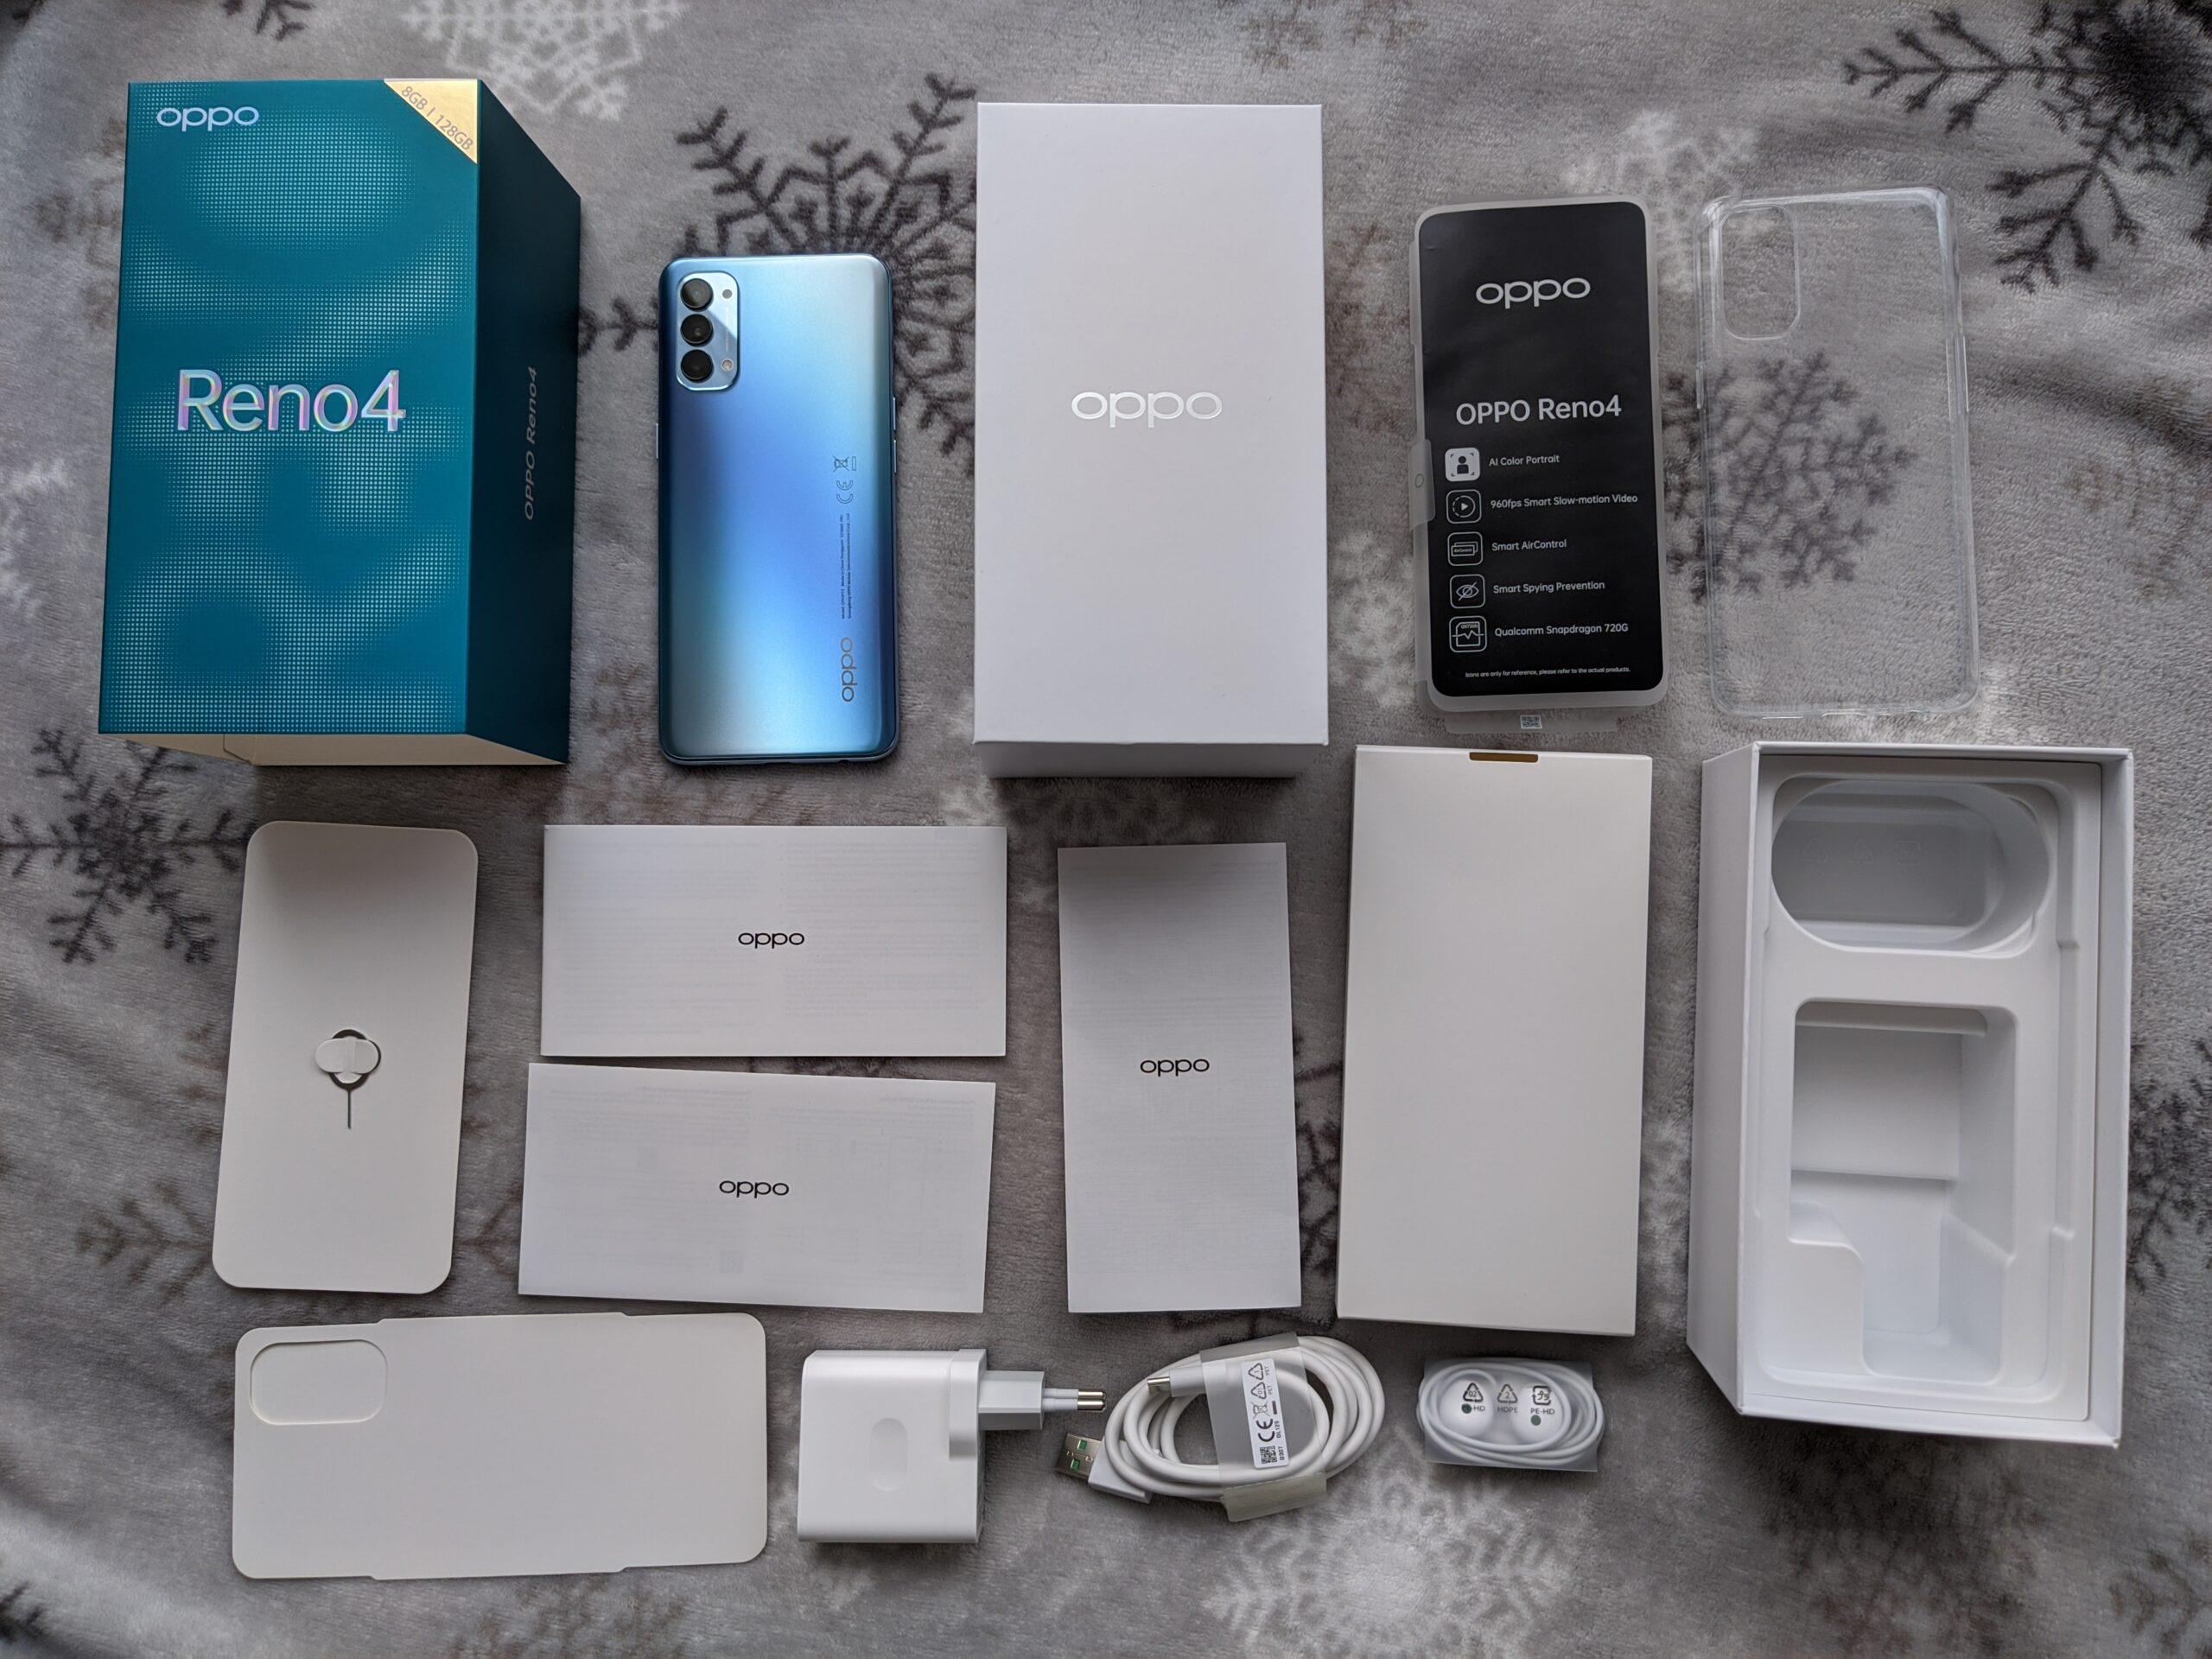 OPPO Reno4 box4